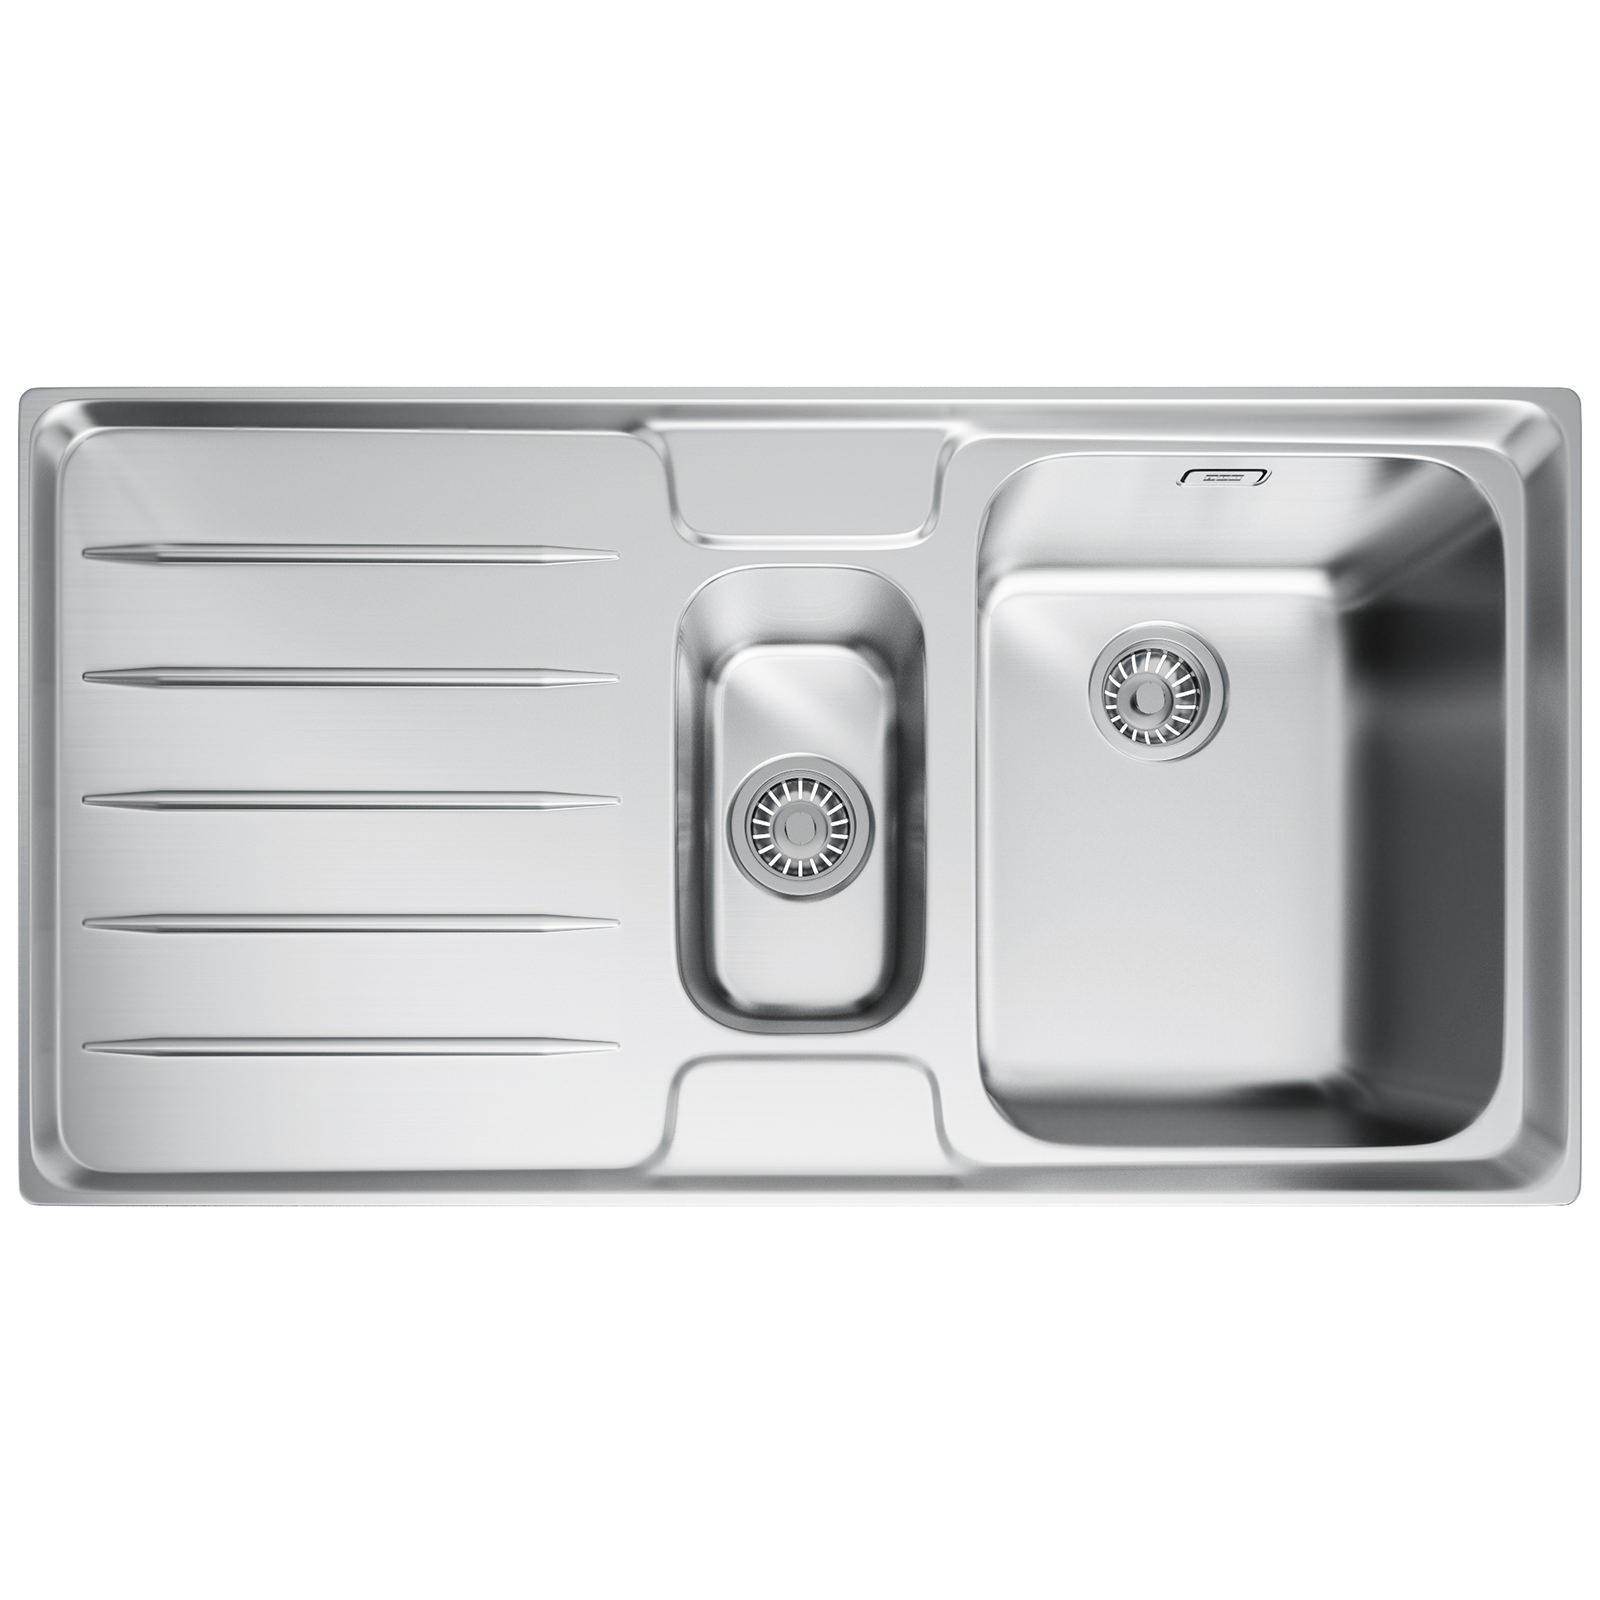 Cleaning Franke Sinks : Franke Laser LSX 651 Stainless Steel Left Hand 1.5 Bowl Inset Sink